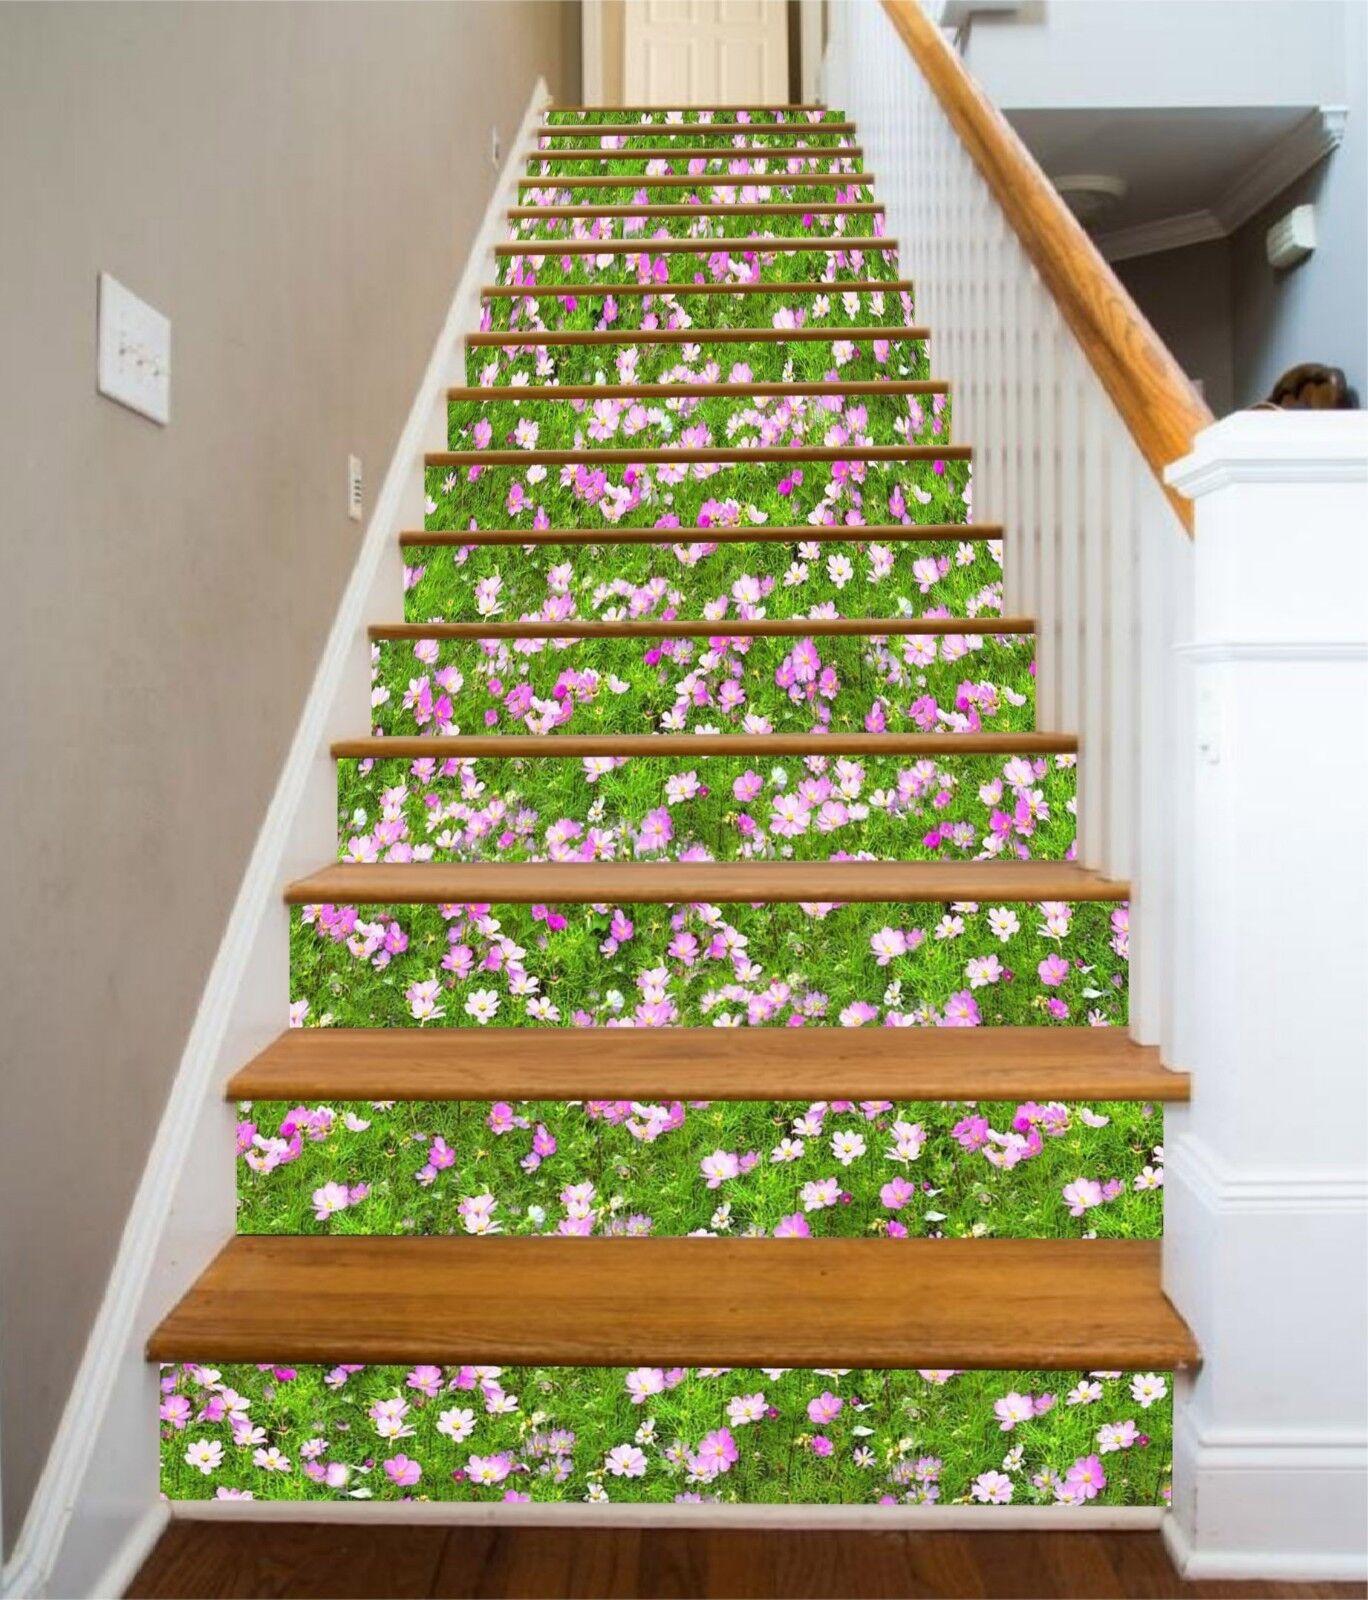 3D Gras bluemen 304 Stair Risers Dekoration Fototapete Vinyl Aufkleber Tapete DE